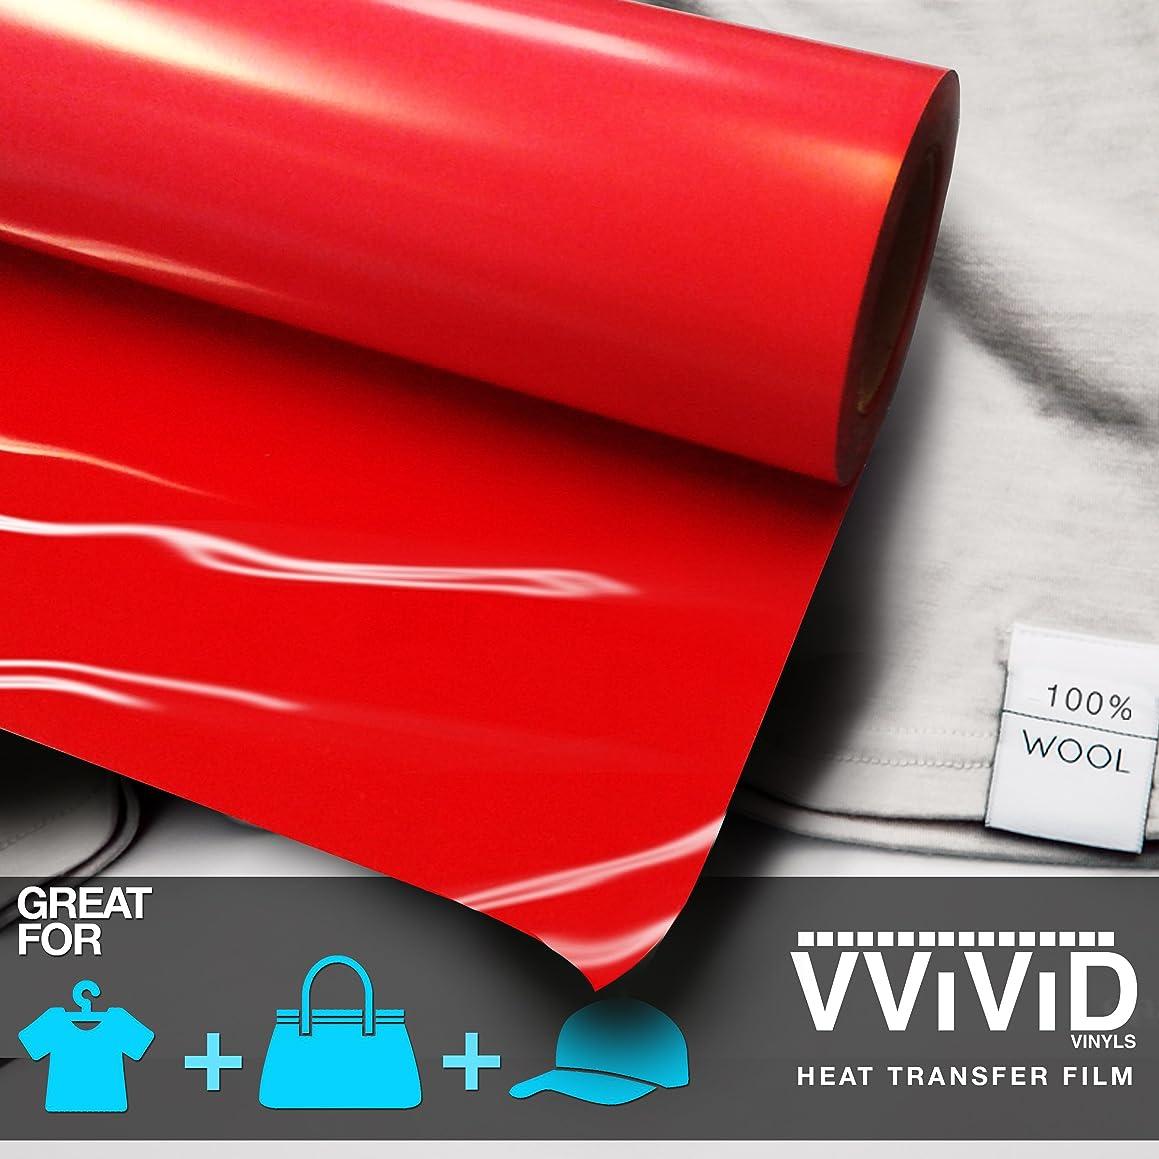 VViViD Red Heavy-Duty Iron-on Heat Transfer Vinyl Film (12